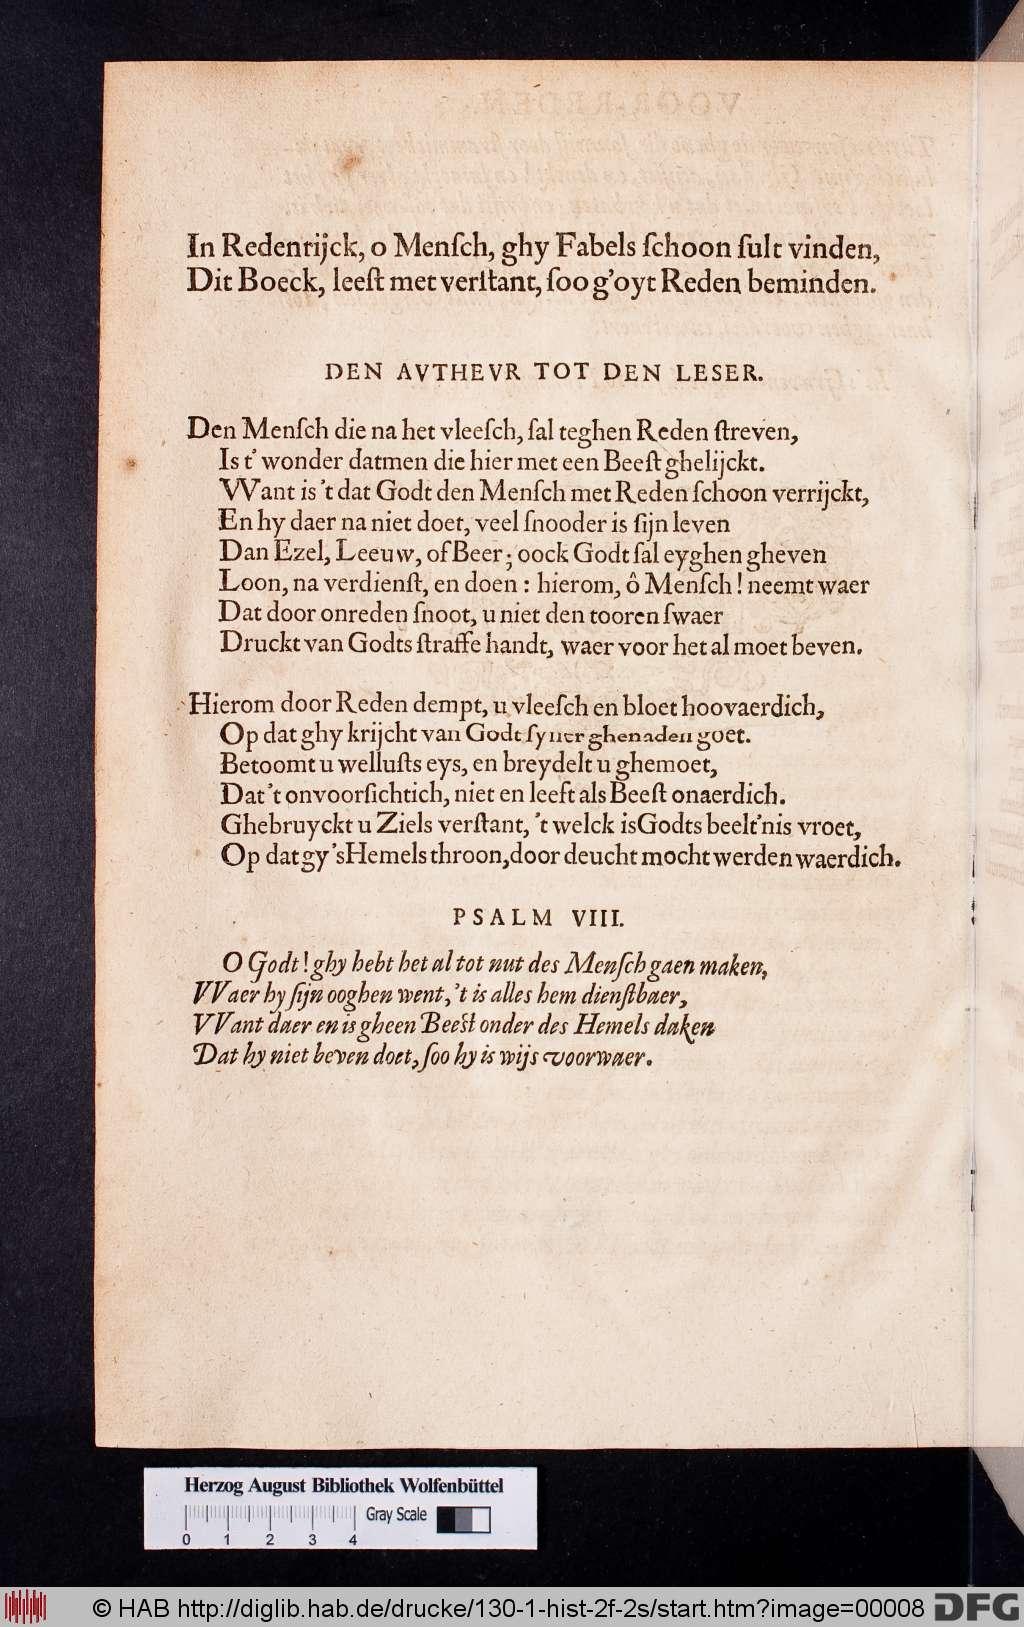 http://diglib.hab.de/drucke/130-1-hist-2f-2s/00008.jpg